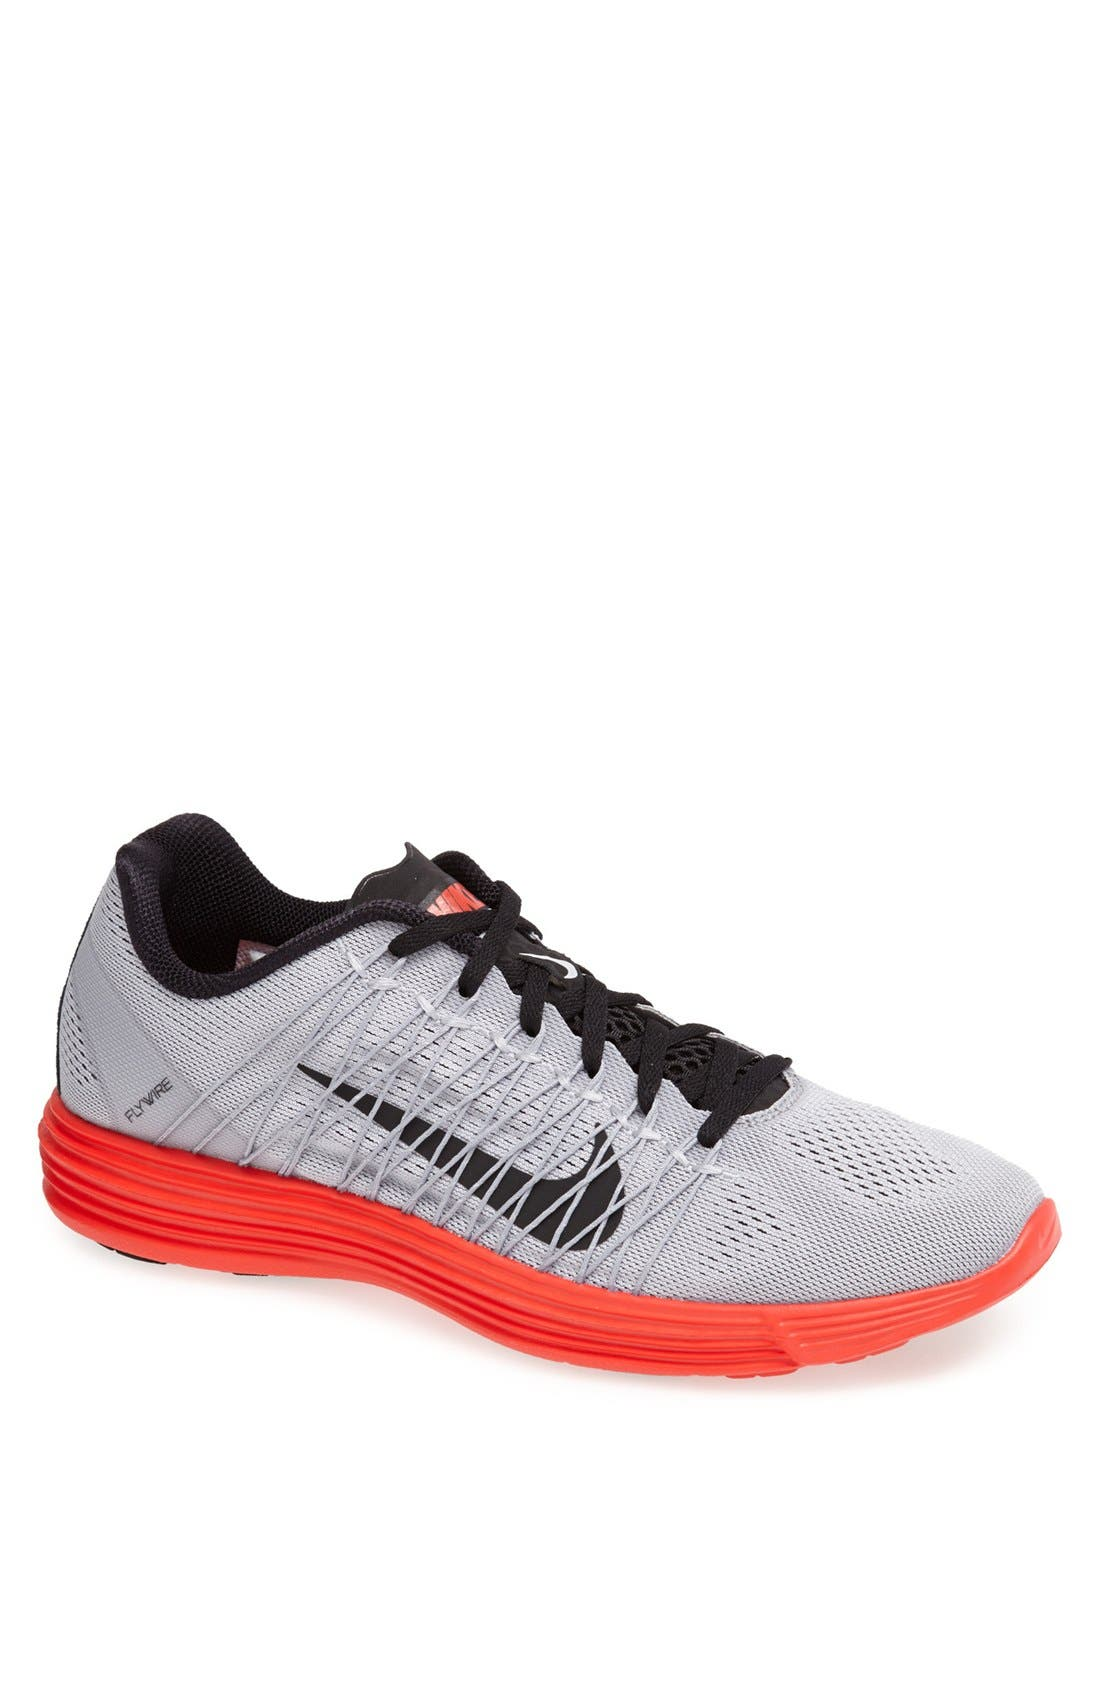 29078fc4ebbd9 ... Nike Lunaracer+ 3 Running Shoe (Men) Nordstrom ...